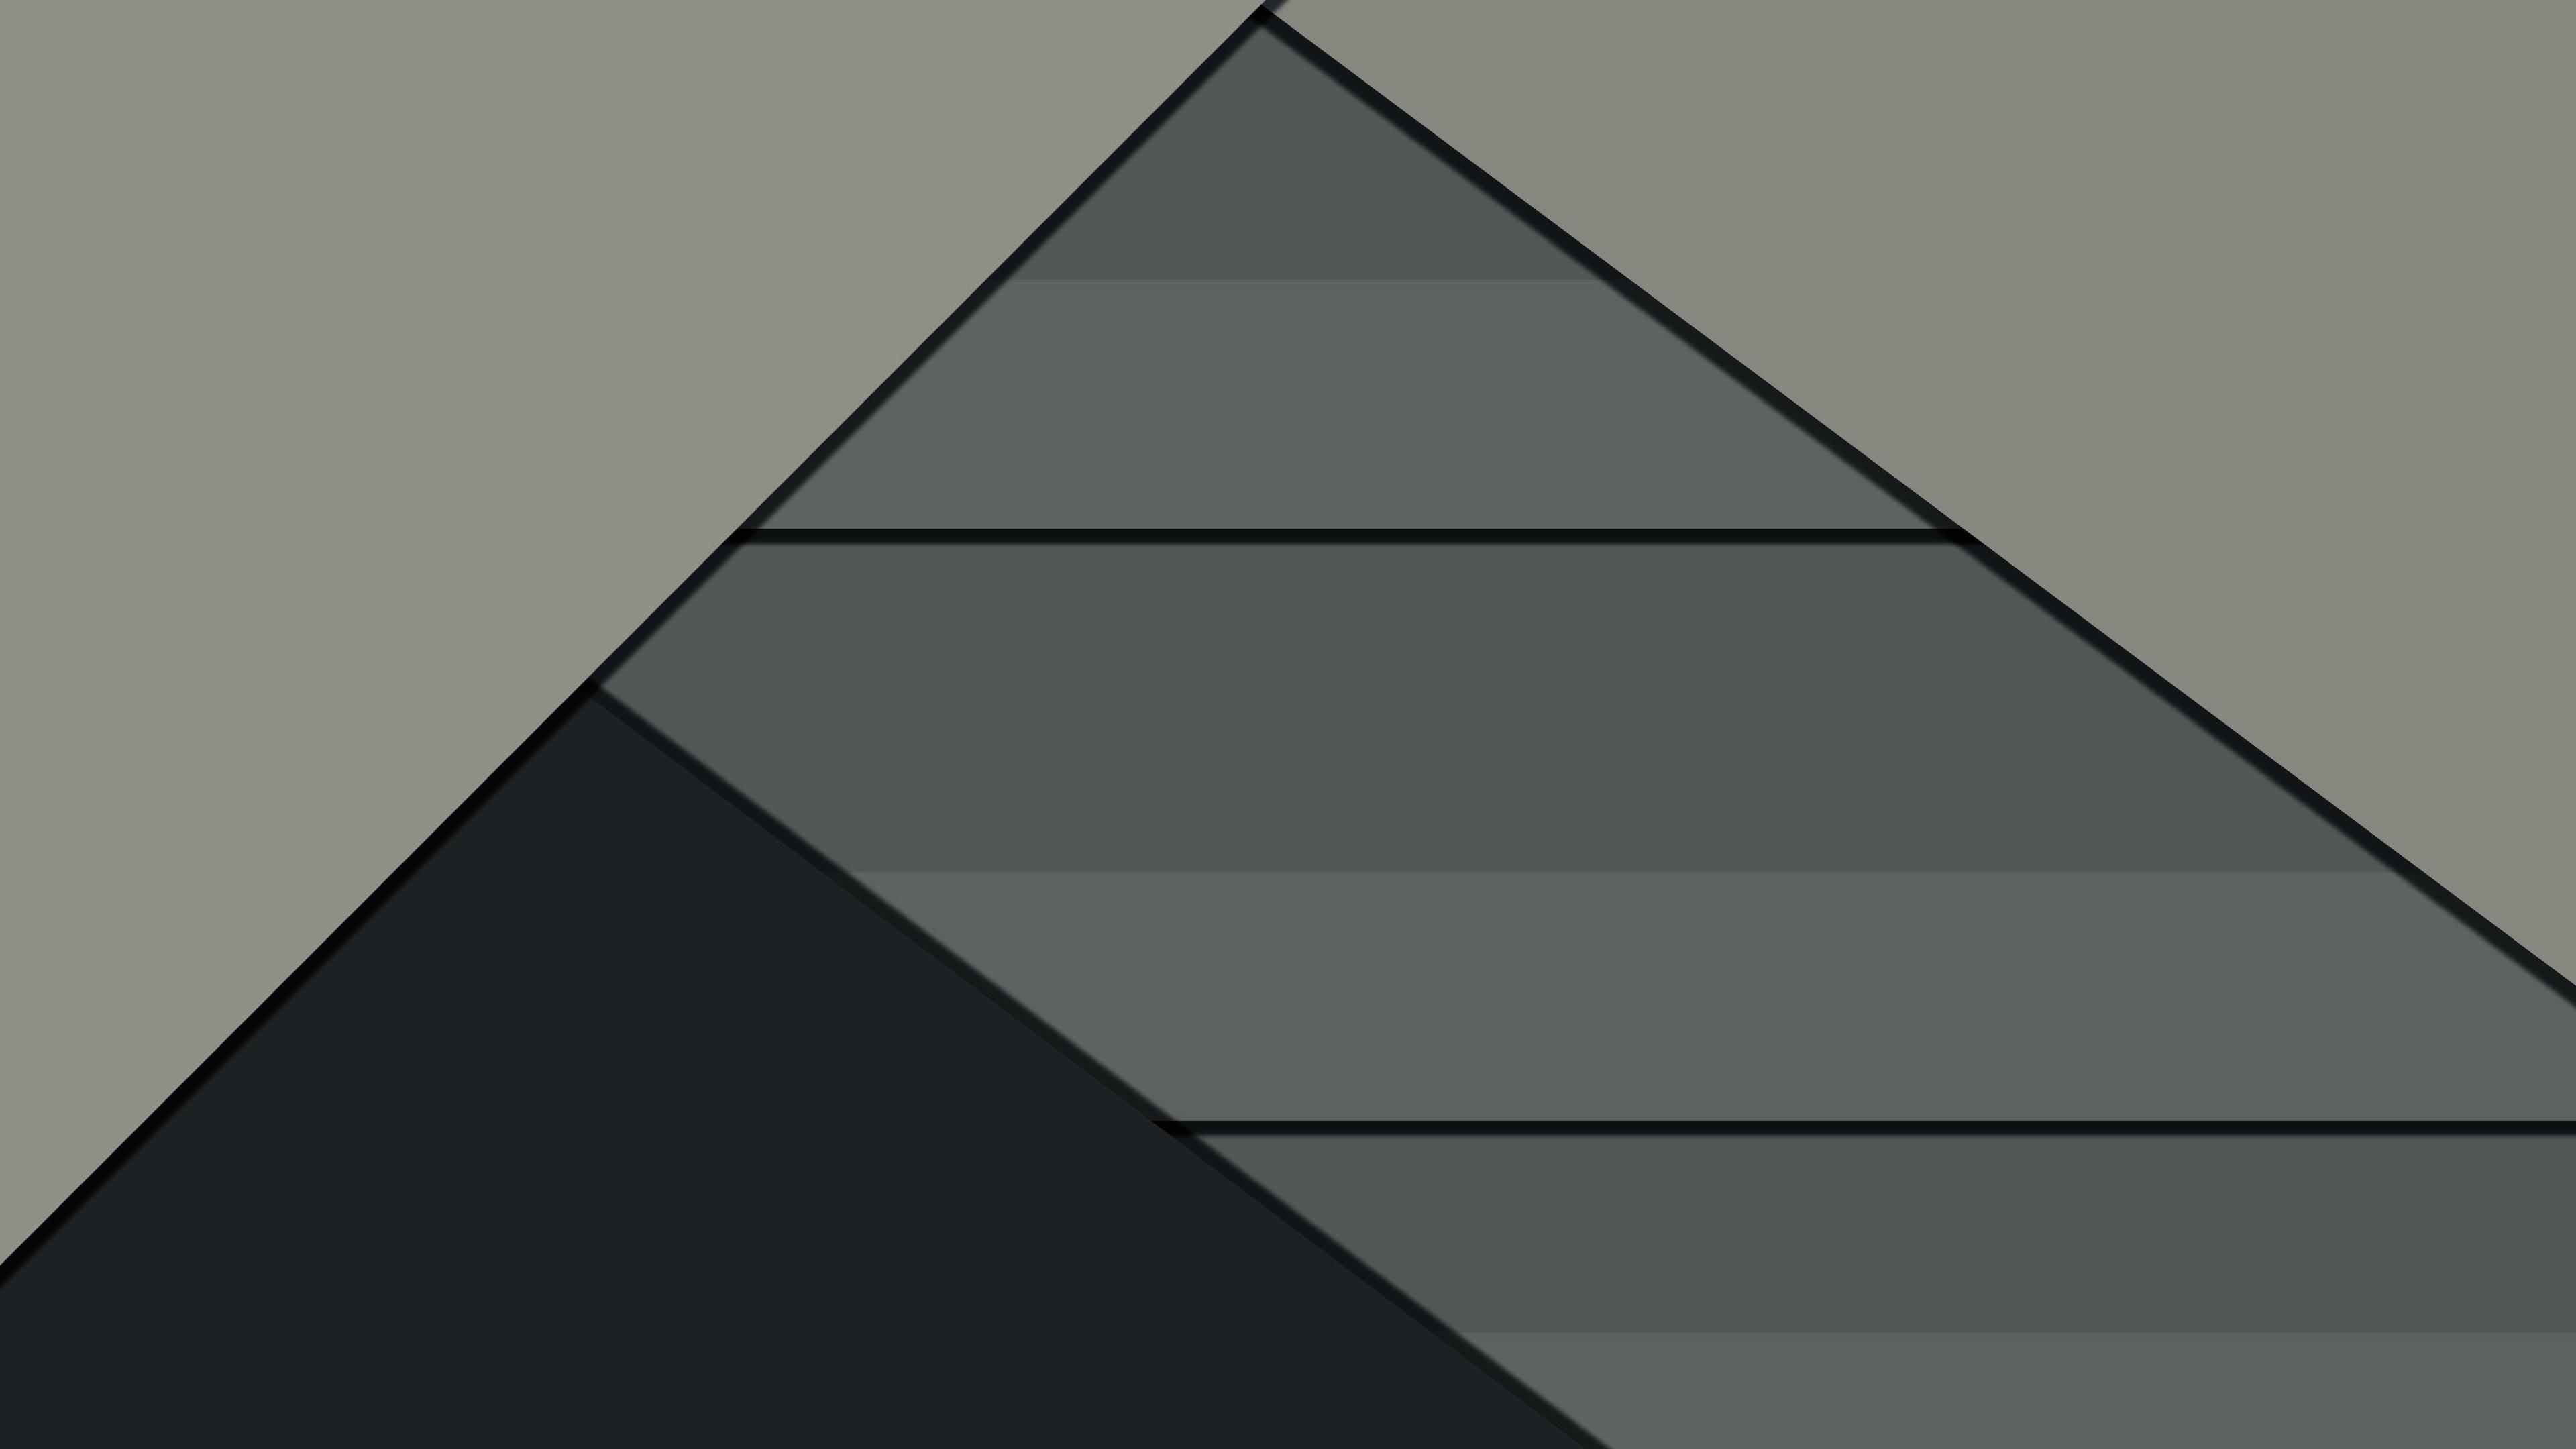 material triangle 1539370832 - Material Triangle - material wallpapers, hd-wallpapers, design wallpapers, artist wallpapers, abstract wallpapers, 5k wallpapers, 4k-wallpapers